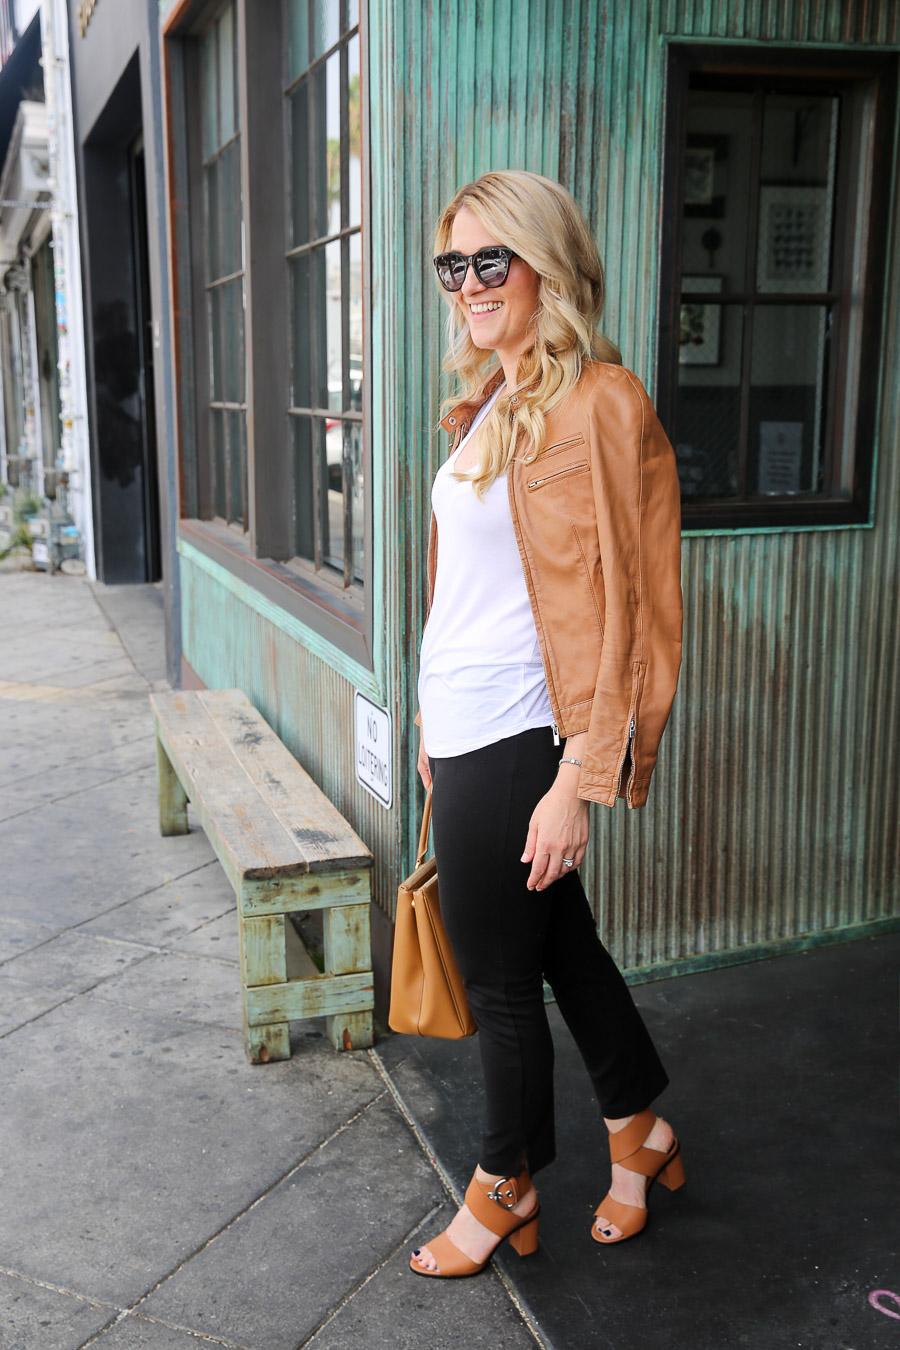 Flattering Black Pants for Women - Rebecca Minkoff Heels Review